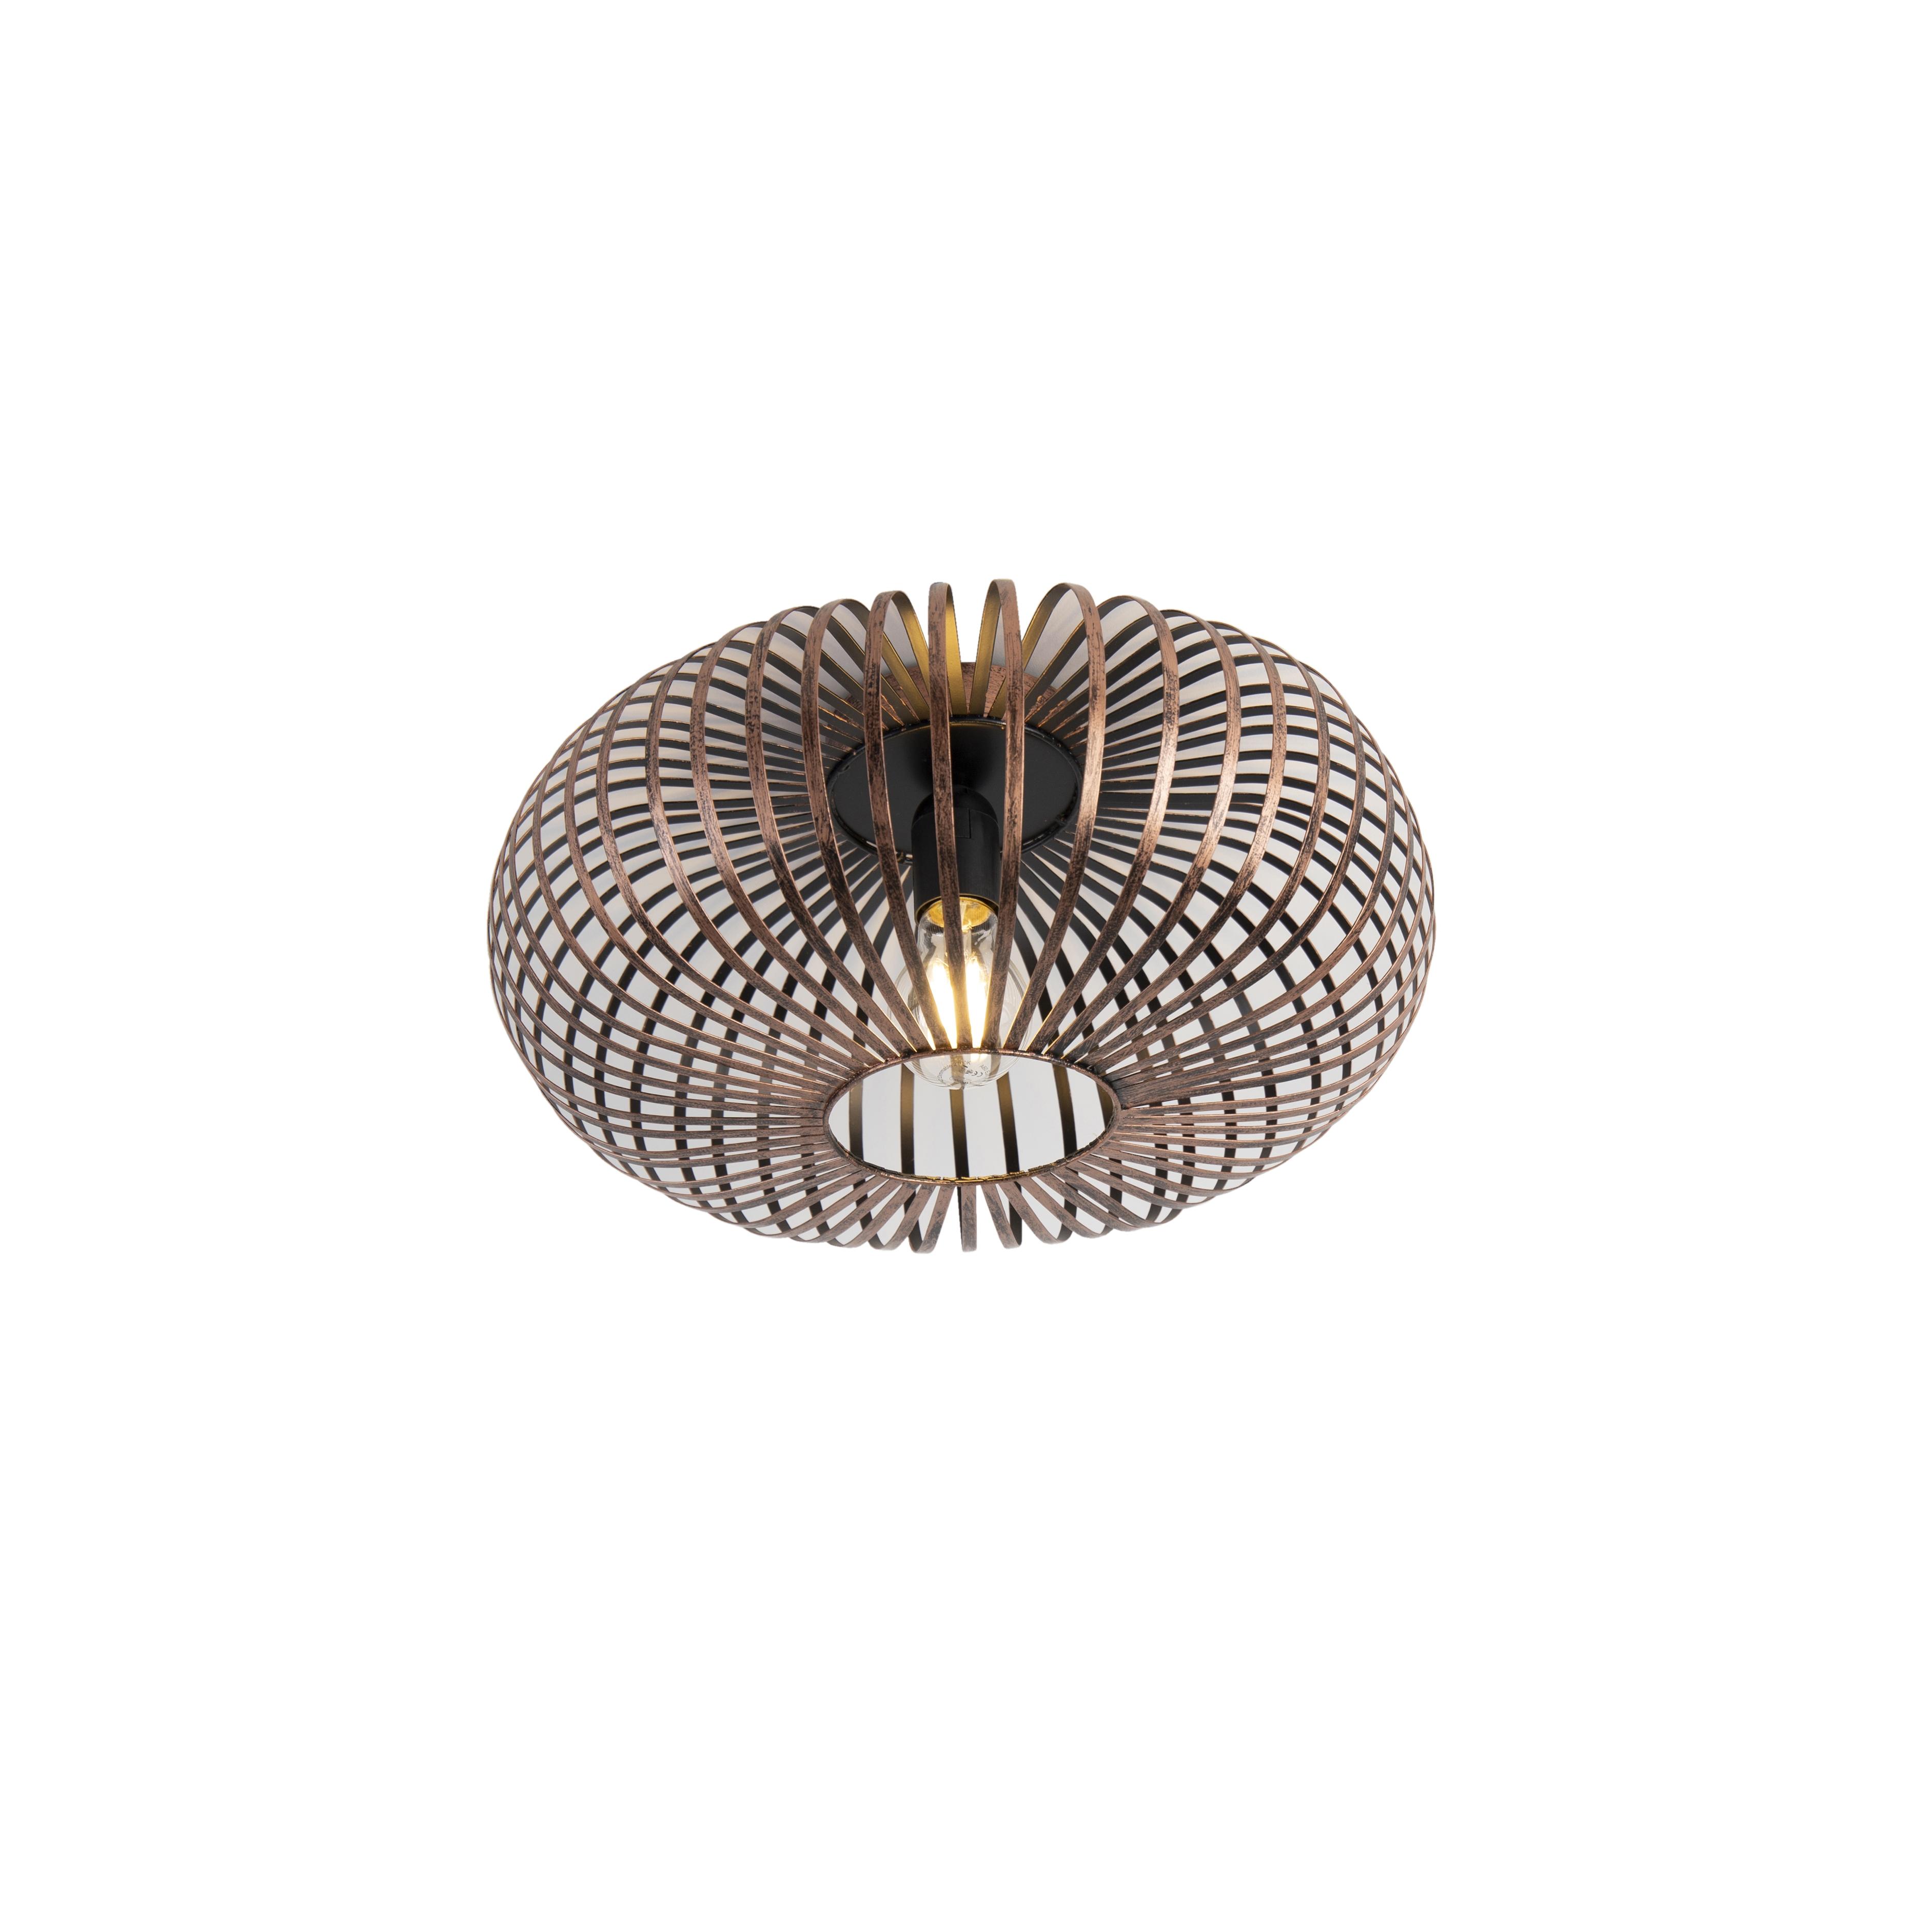 Design ronde plafondlamp roestbruin - Johanna